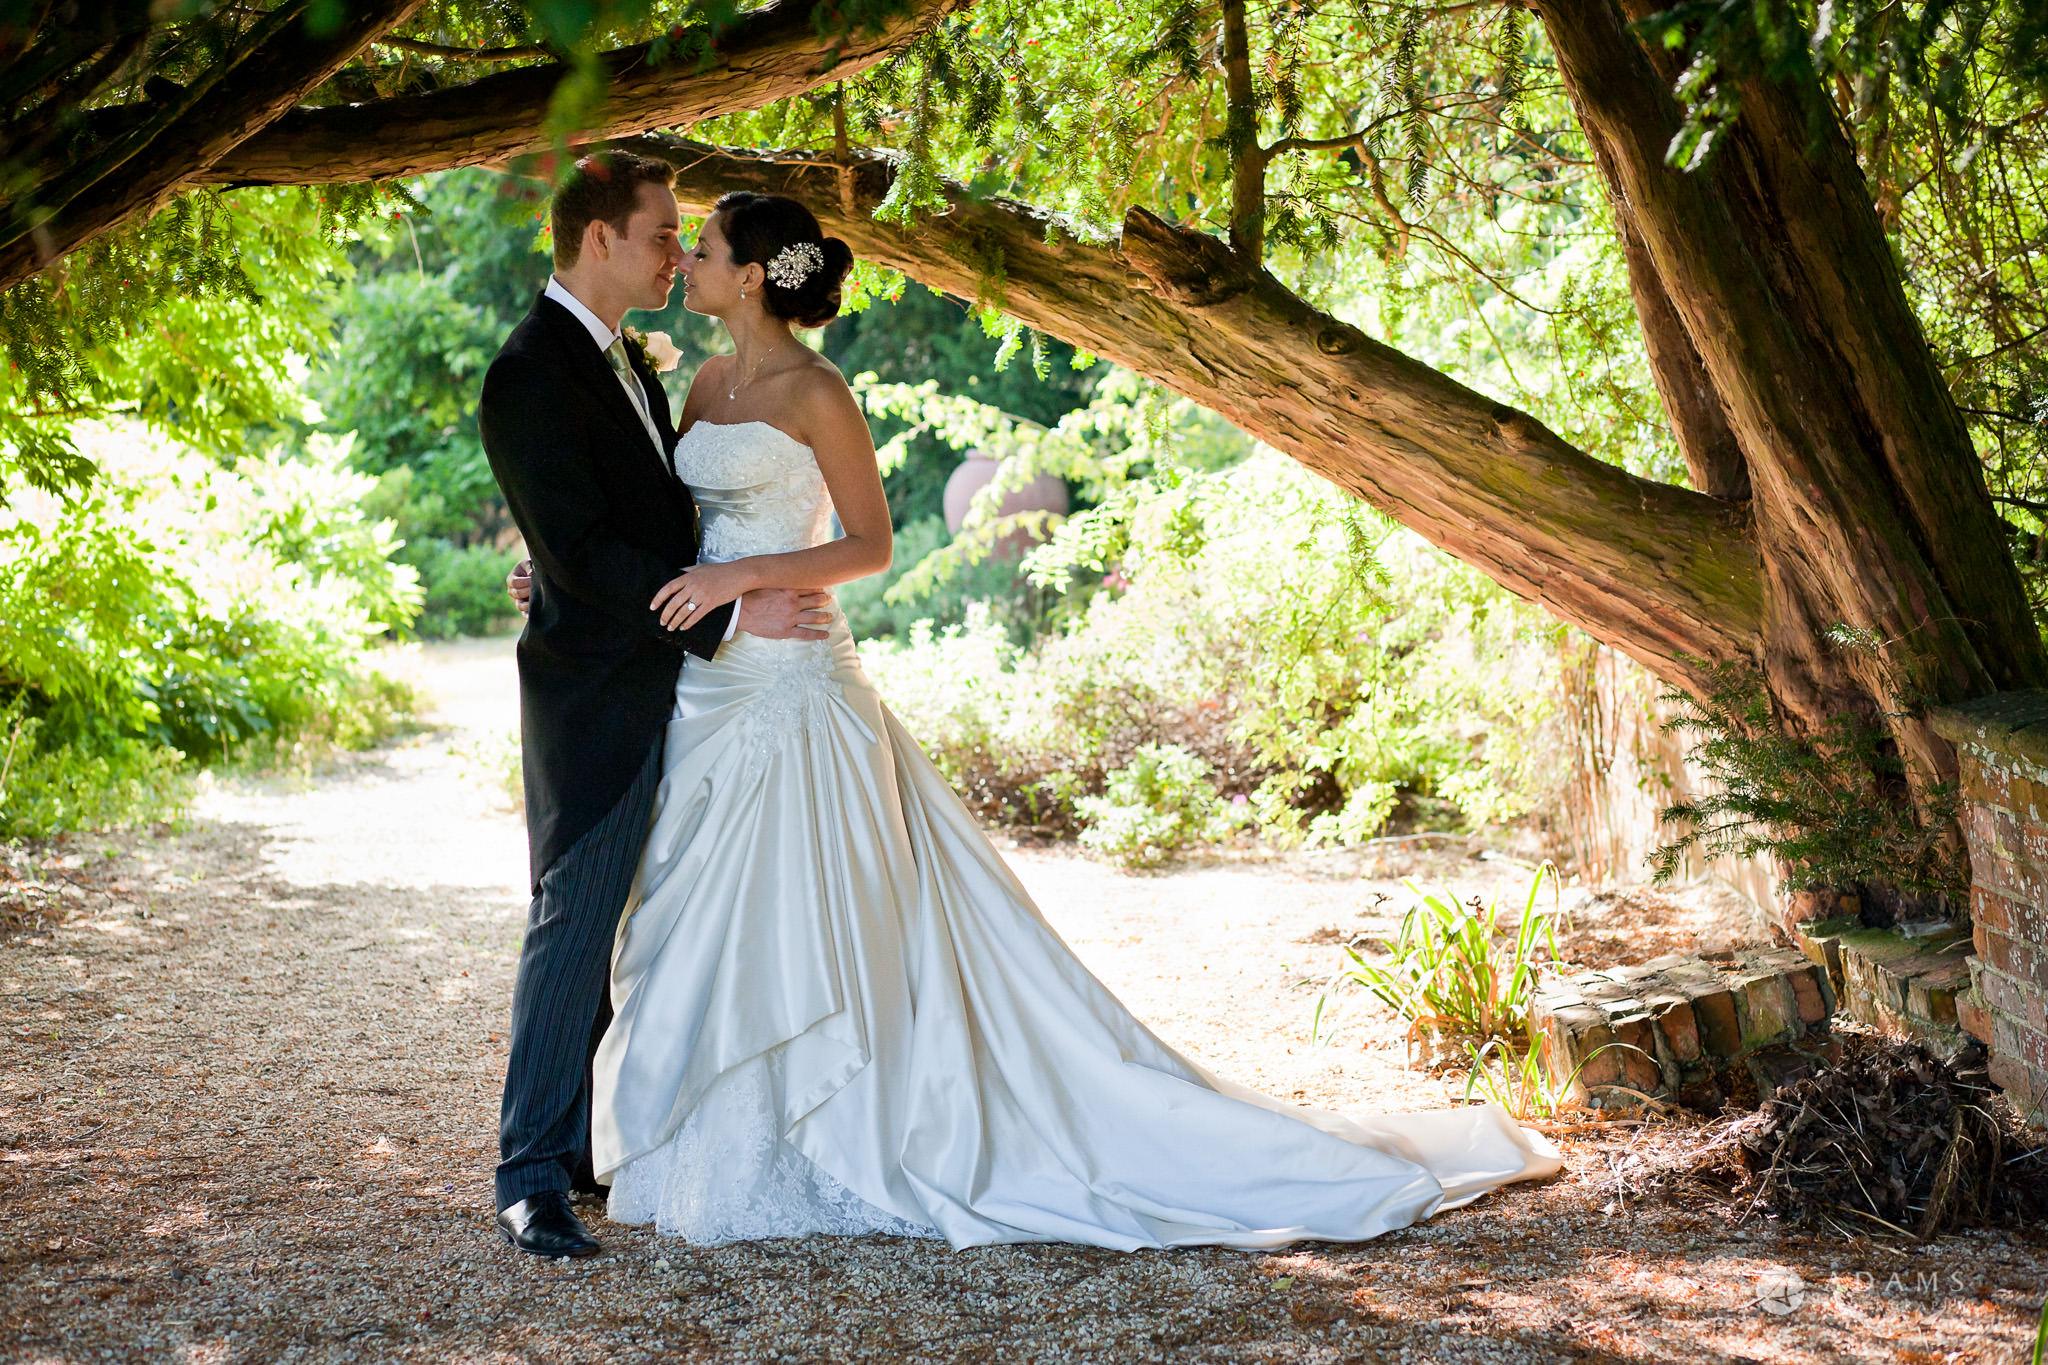 Kingston Bagpuize House wedding couple photo shot under the tree